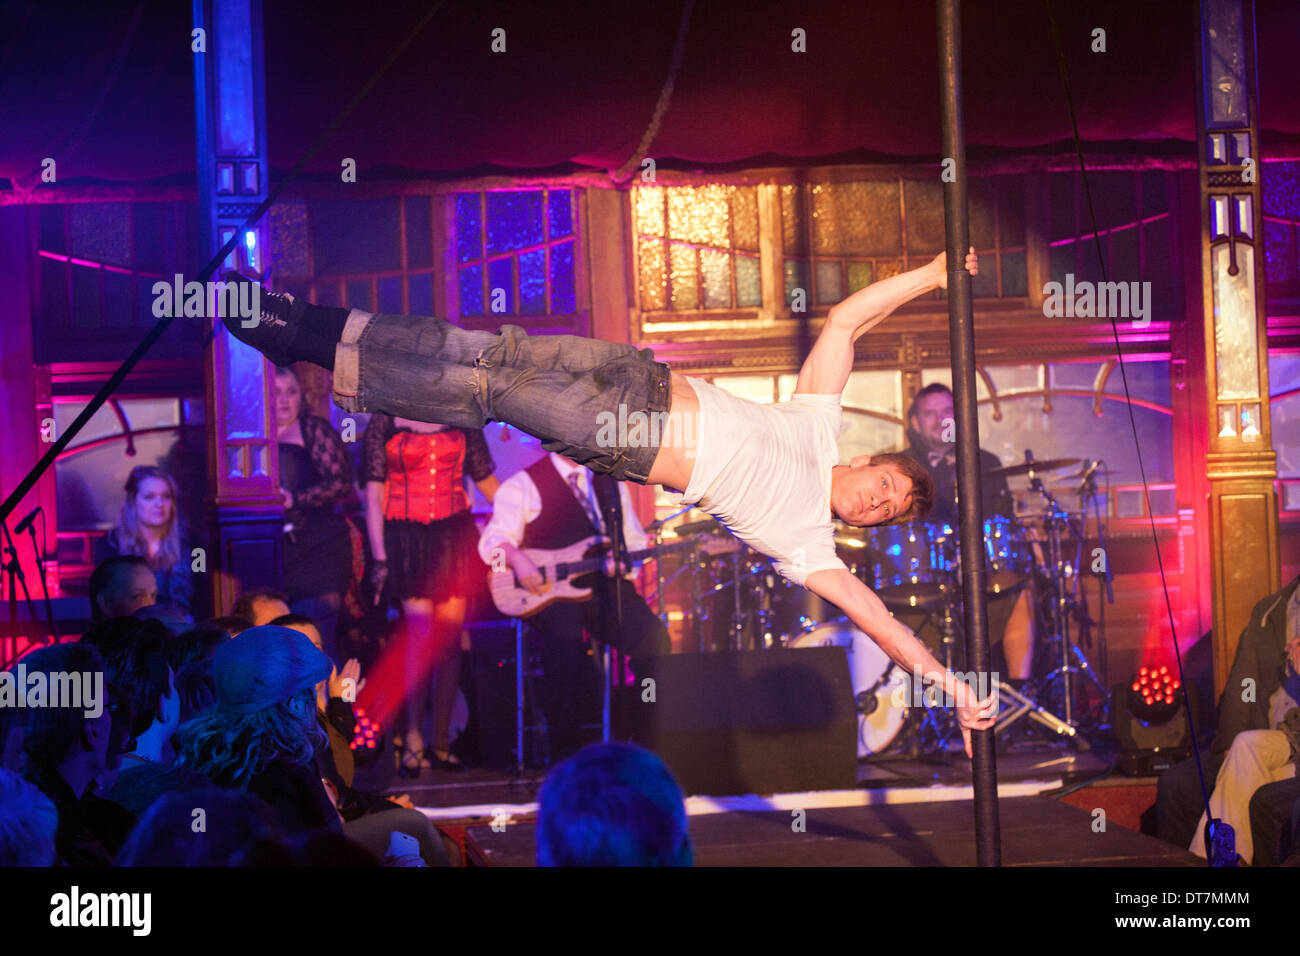 Big Burns Supper 2014, Dumfries, Le Haggis, Edd Muir Cabaret pole dancing. Upper body strength balance acrobat strong - Stock Image